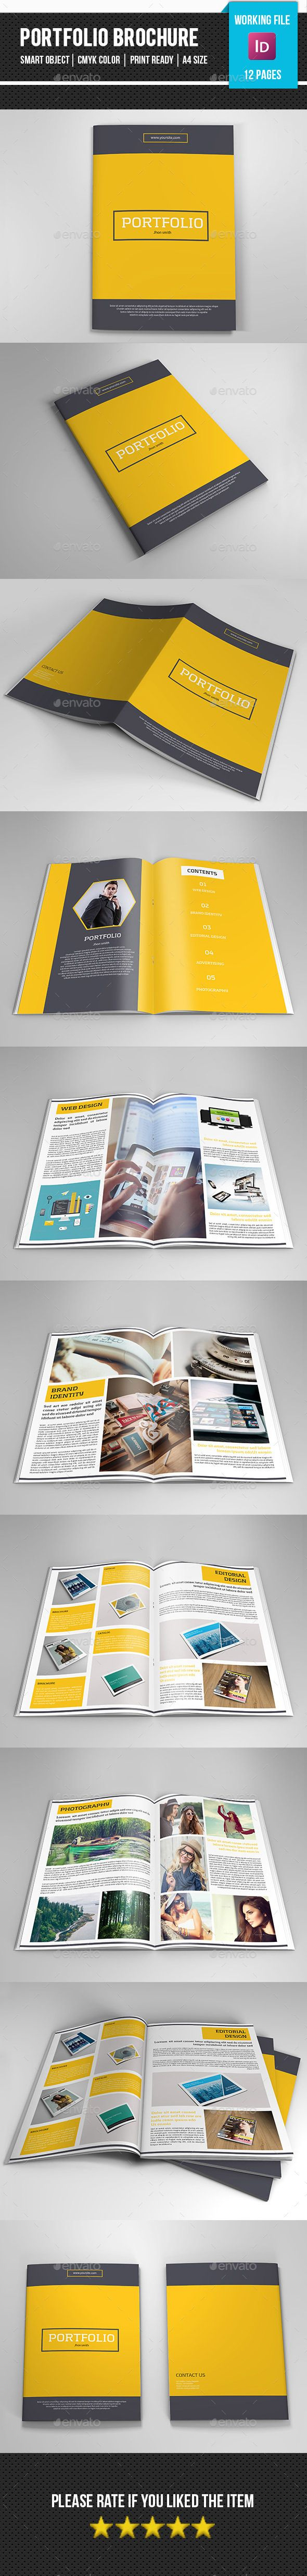 Multipurpose Portfolio Brochure Template #design Download: http://graphicriver.net/item/multipurpose-portfolio-brochurev261/11807864?ref=ksioks